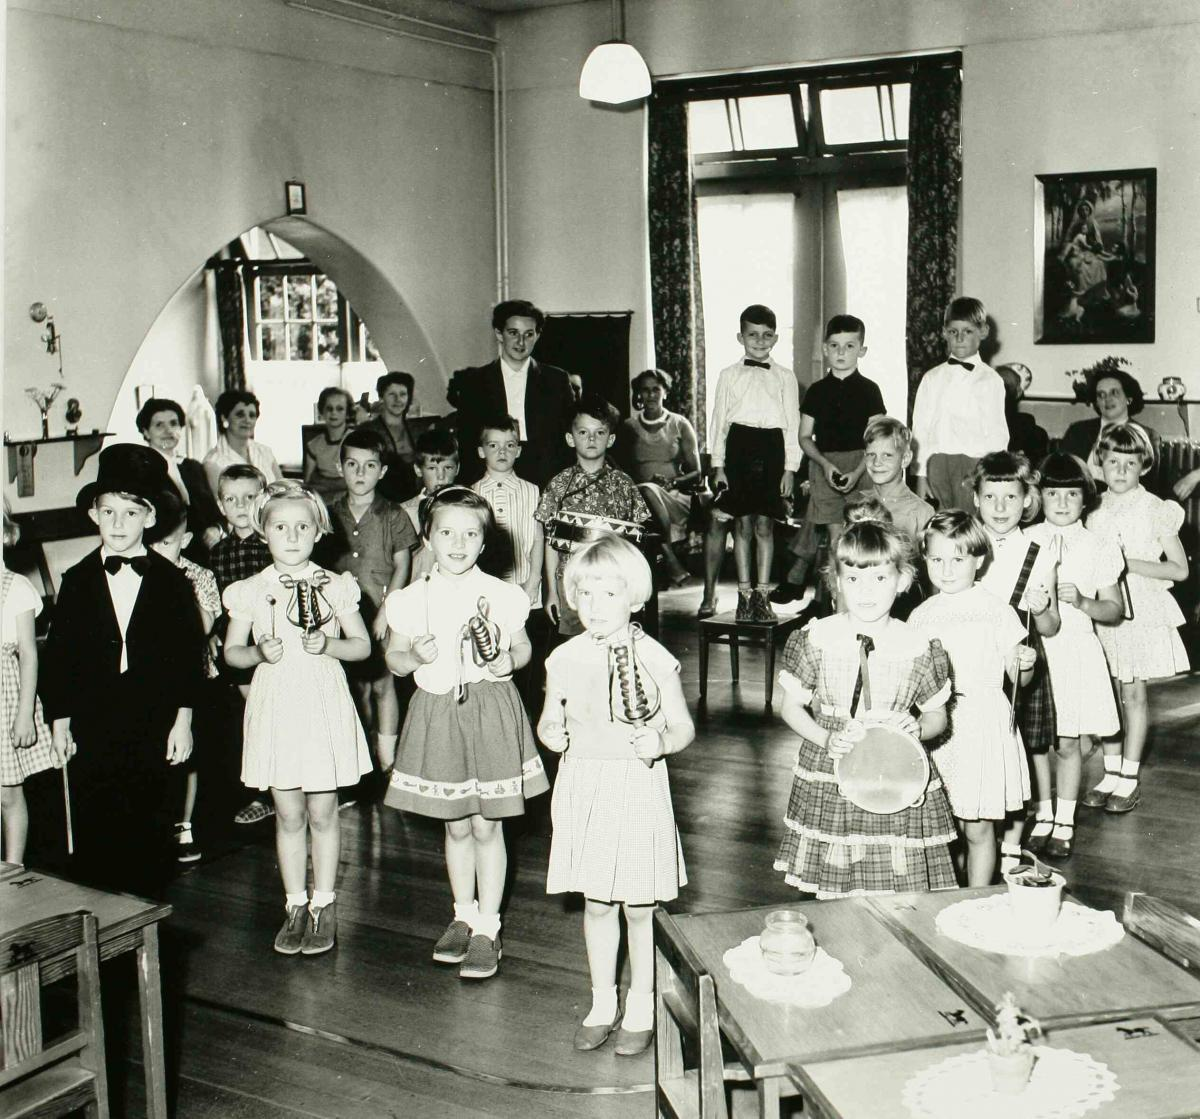 15_1957_fröbelschool_stadsarchief_0025216.jpg